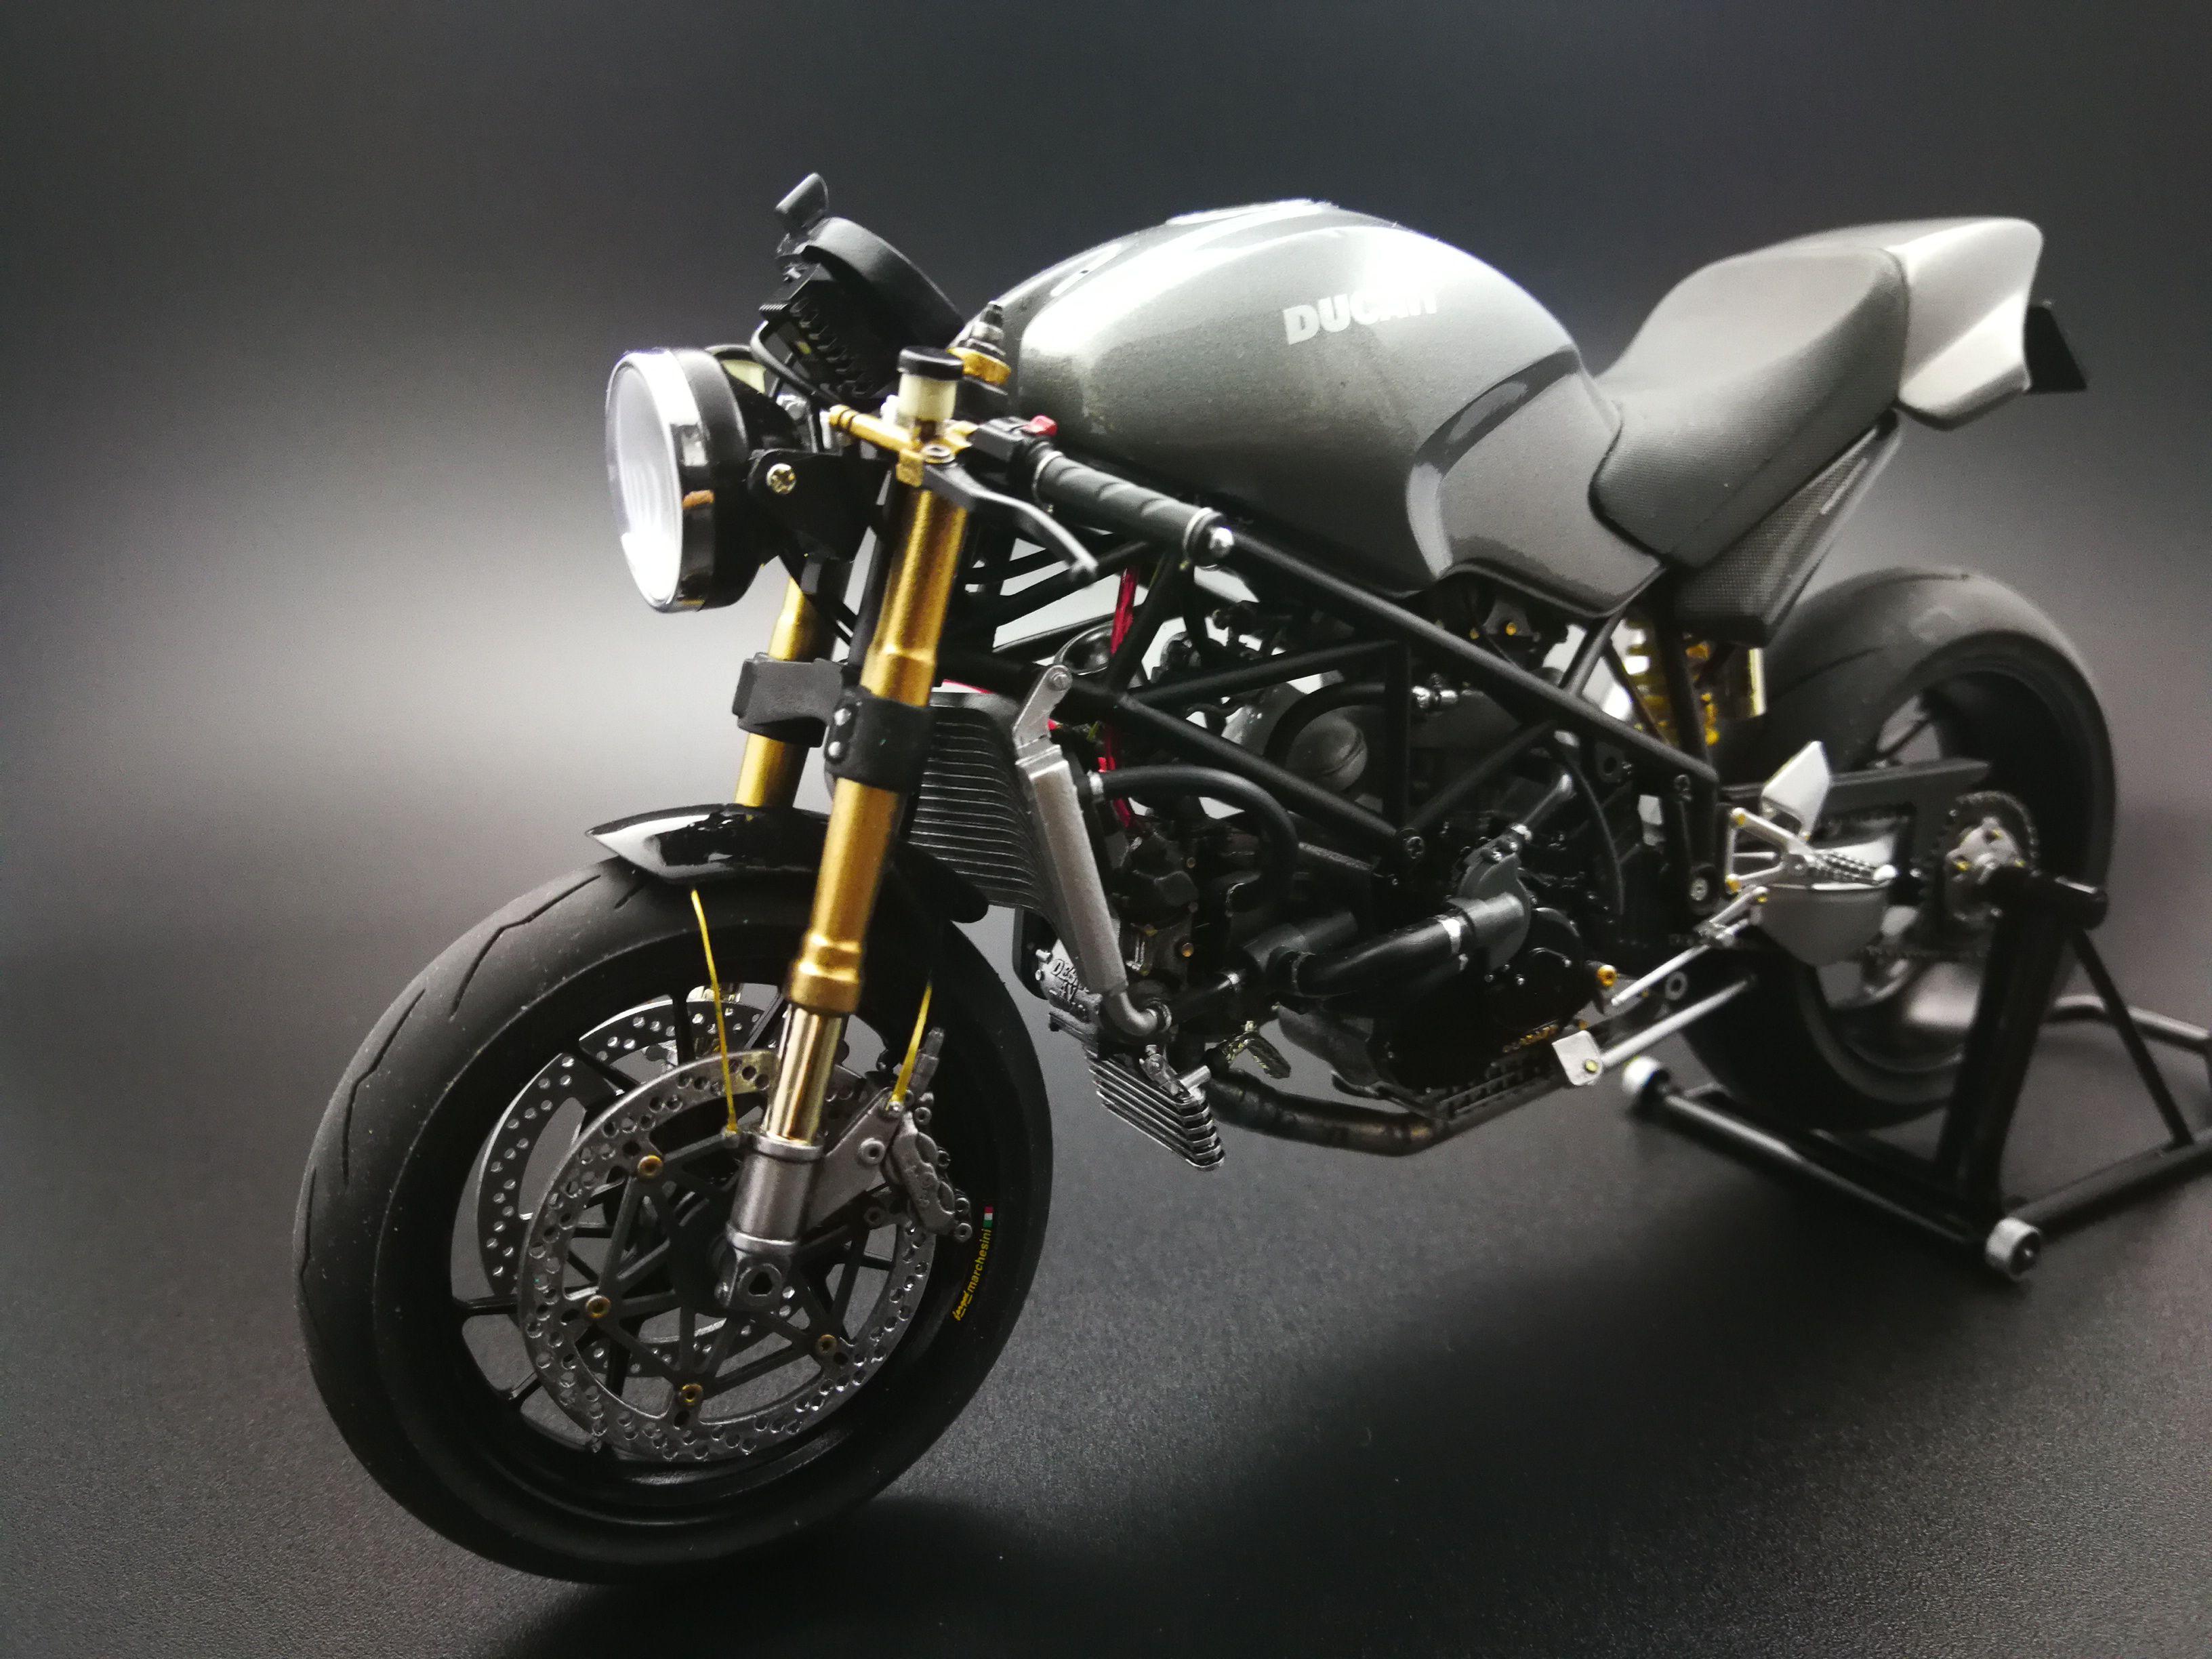 Ducati 916 1 12 Tamiya Ducati 916 Motorcycle Model Ducati